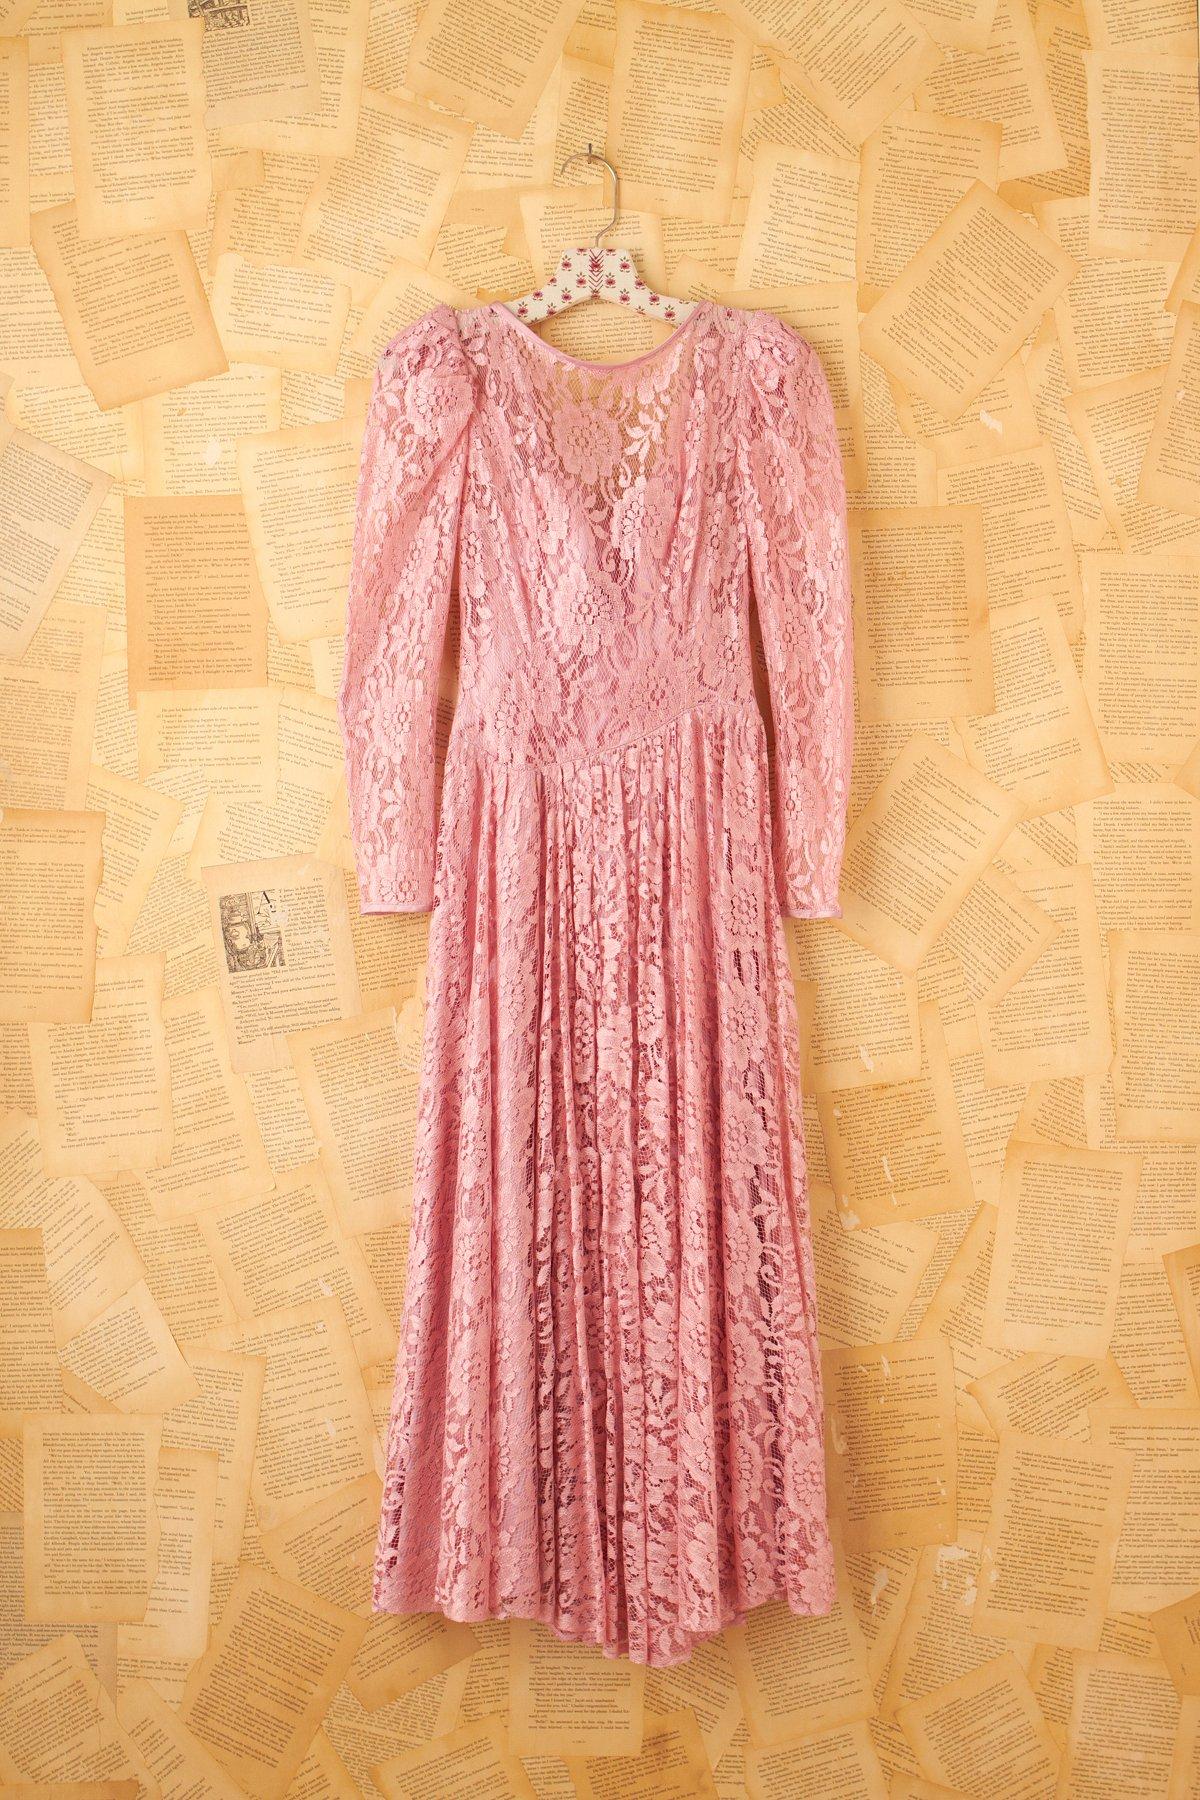 Vintage Pink Lace Princess Dress